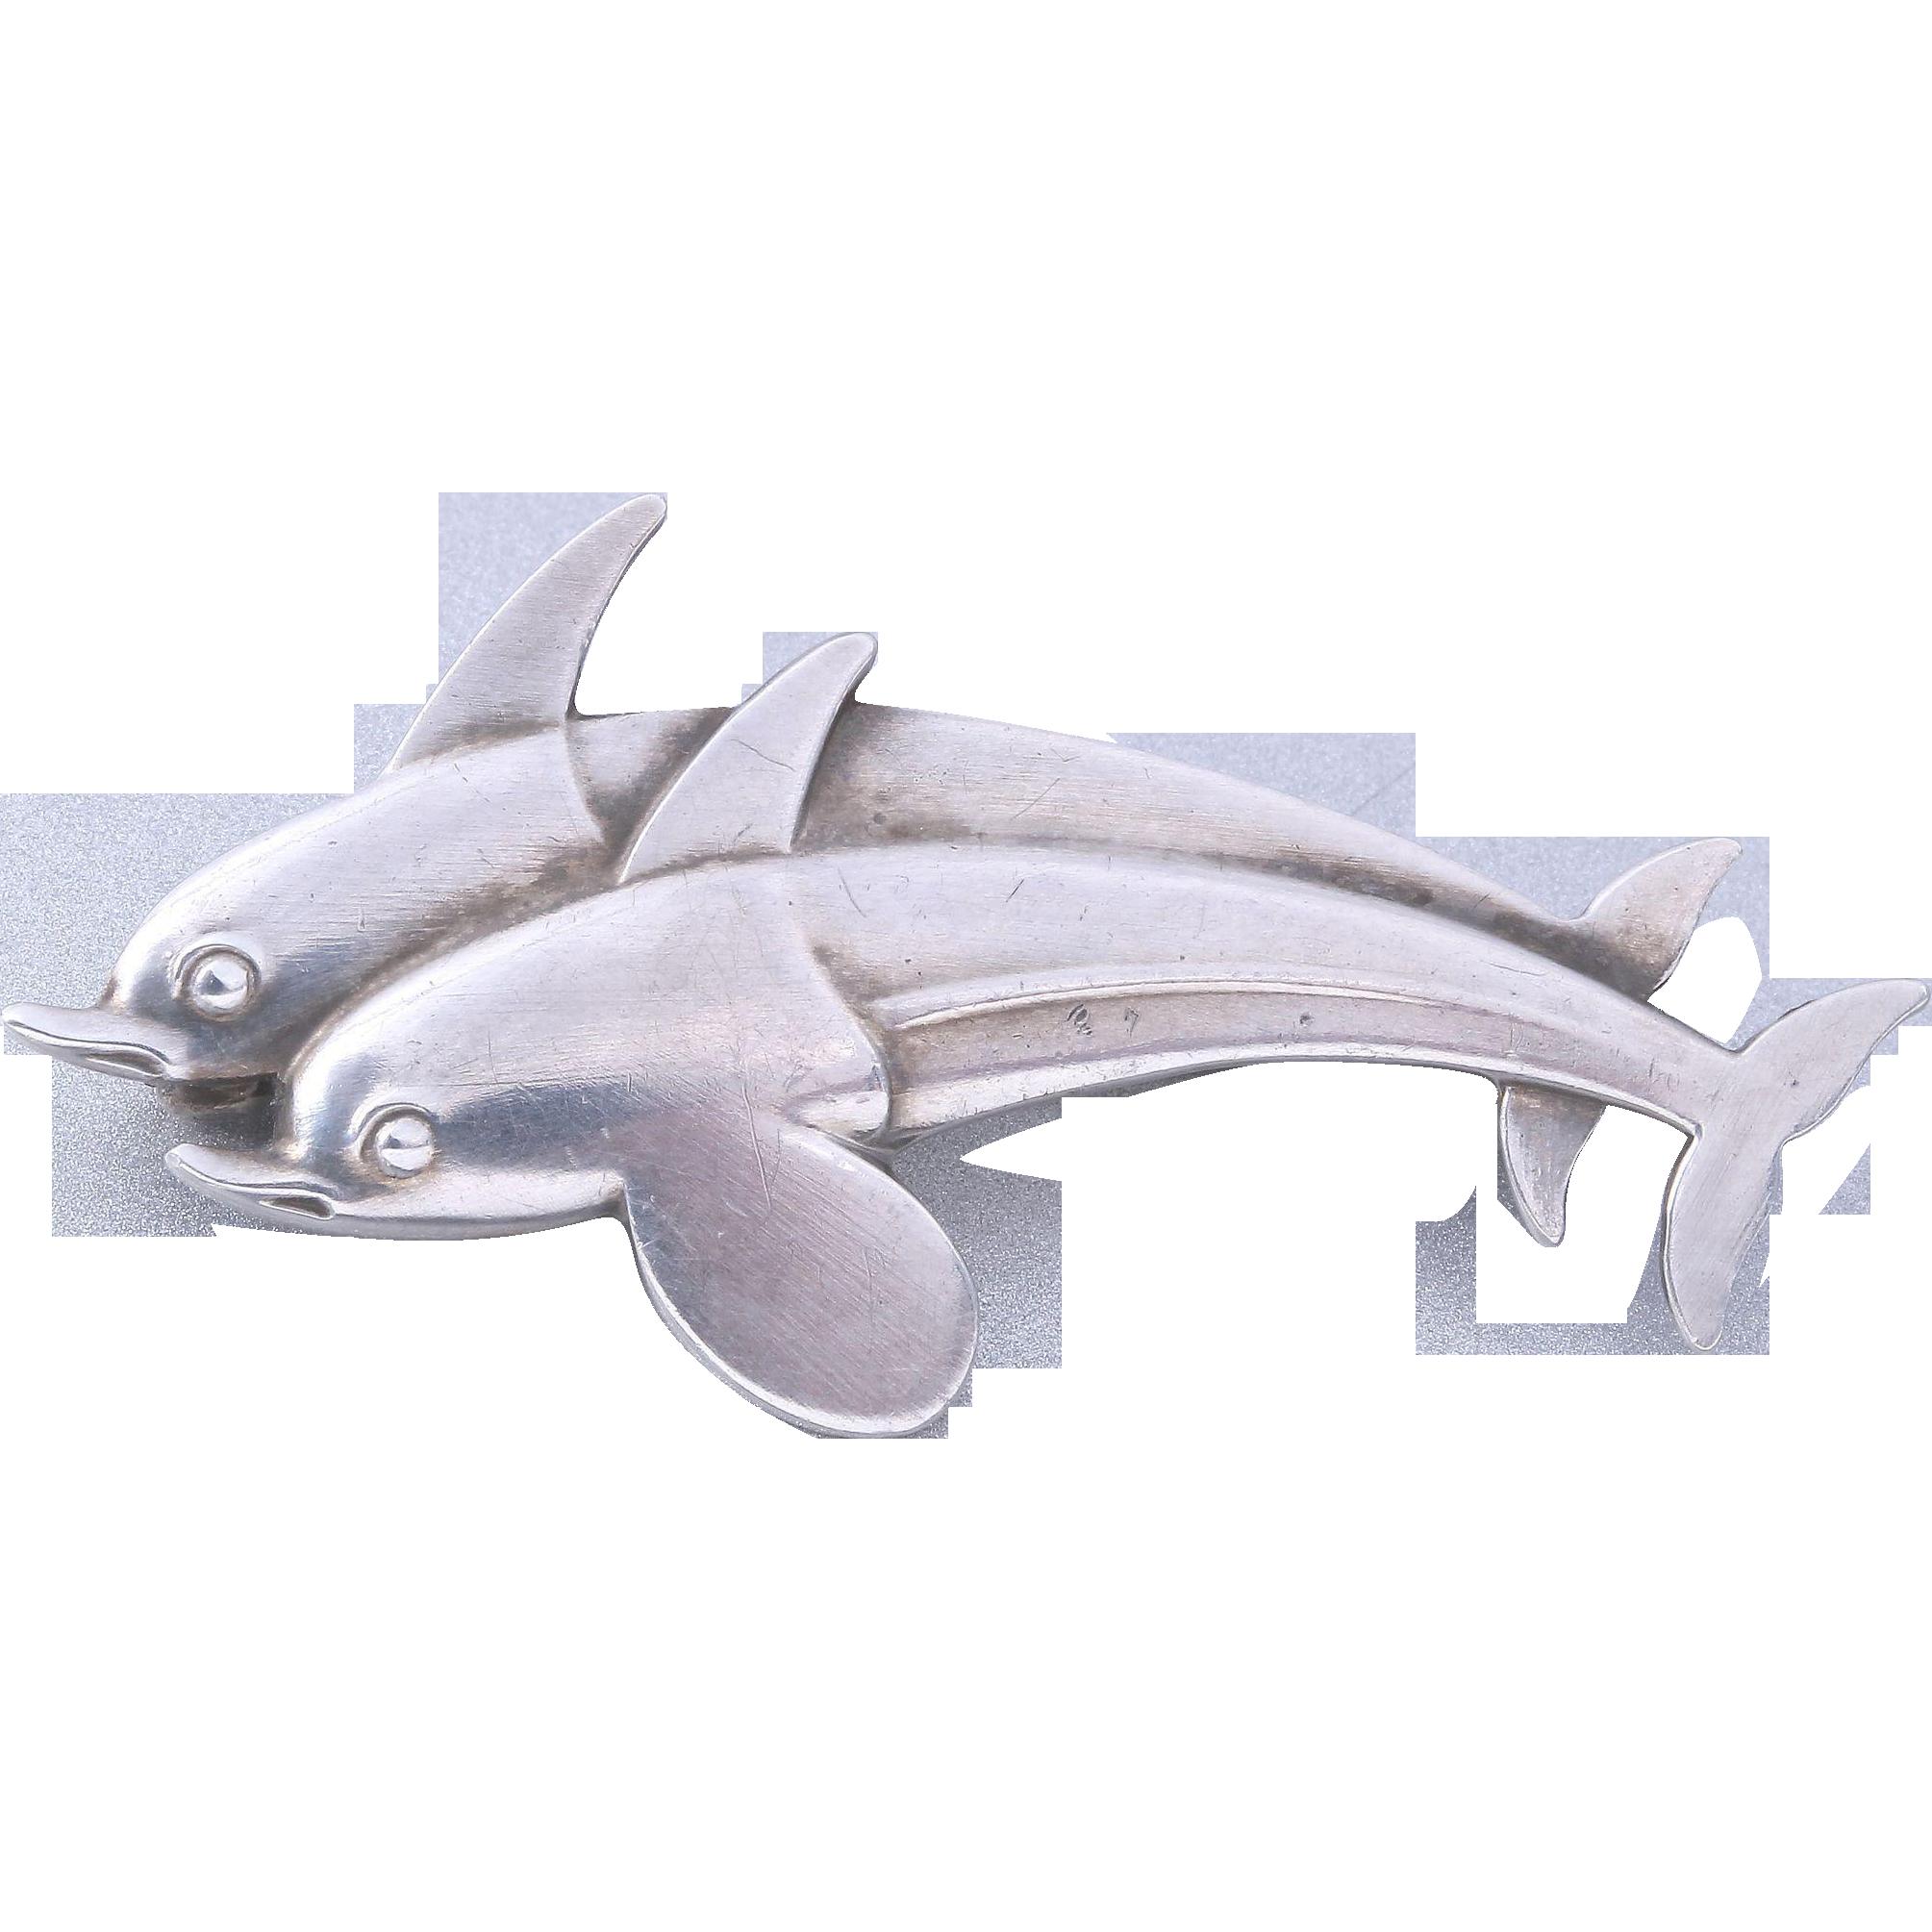 sale georg jensen sterling silver dolphins pin brooch. Black Bedroom Furniture Sets. Home Design Ideas